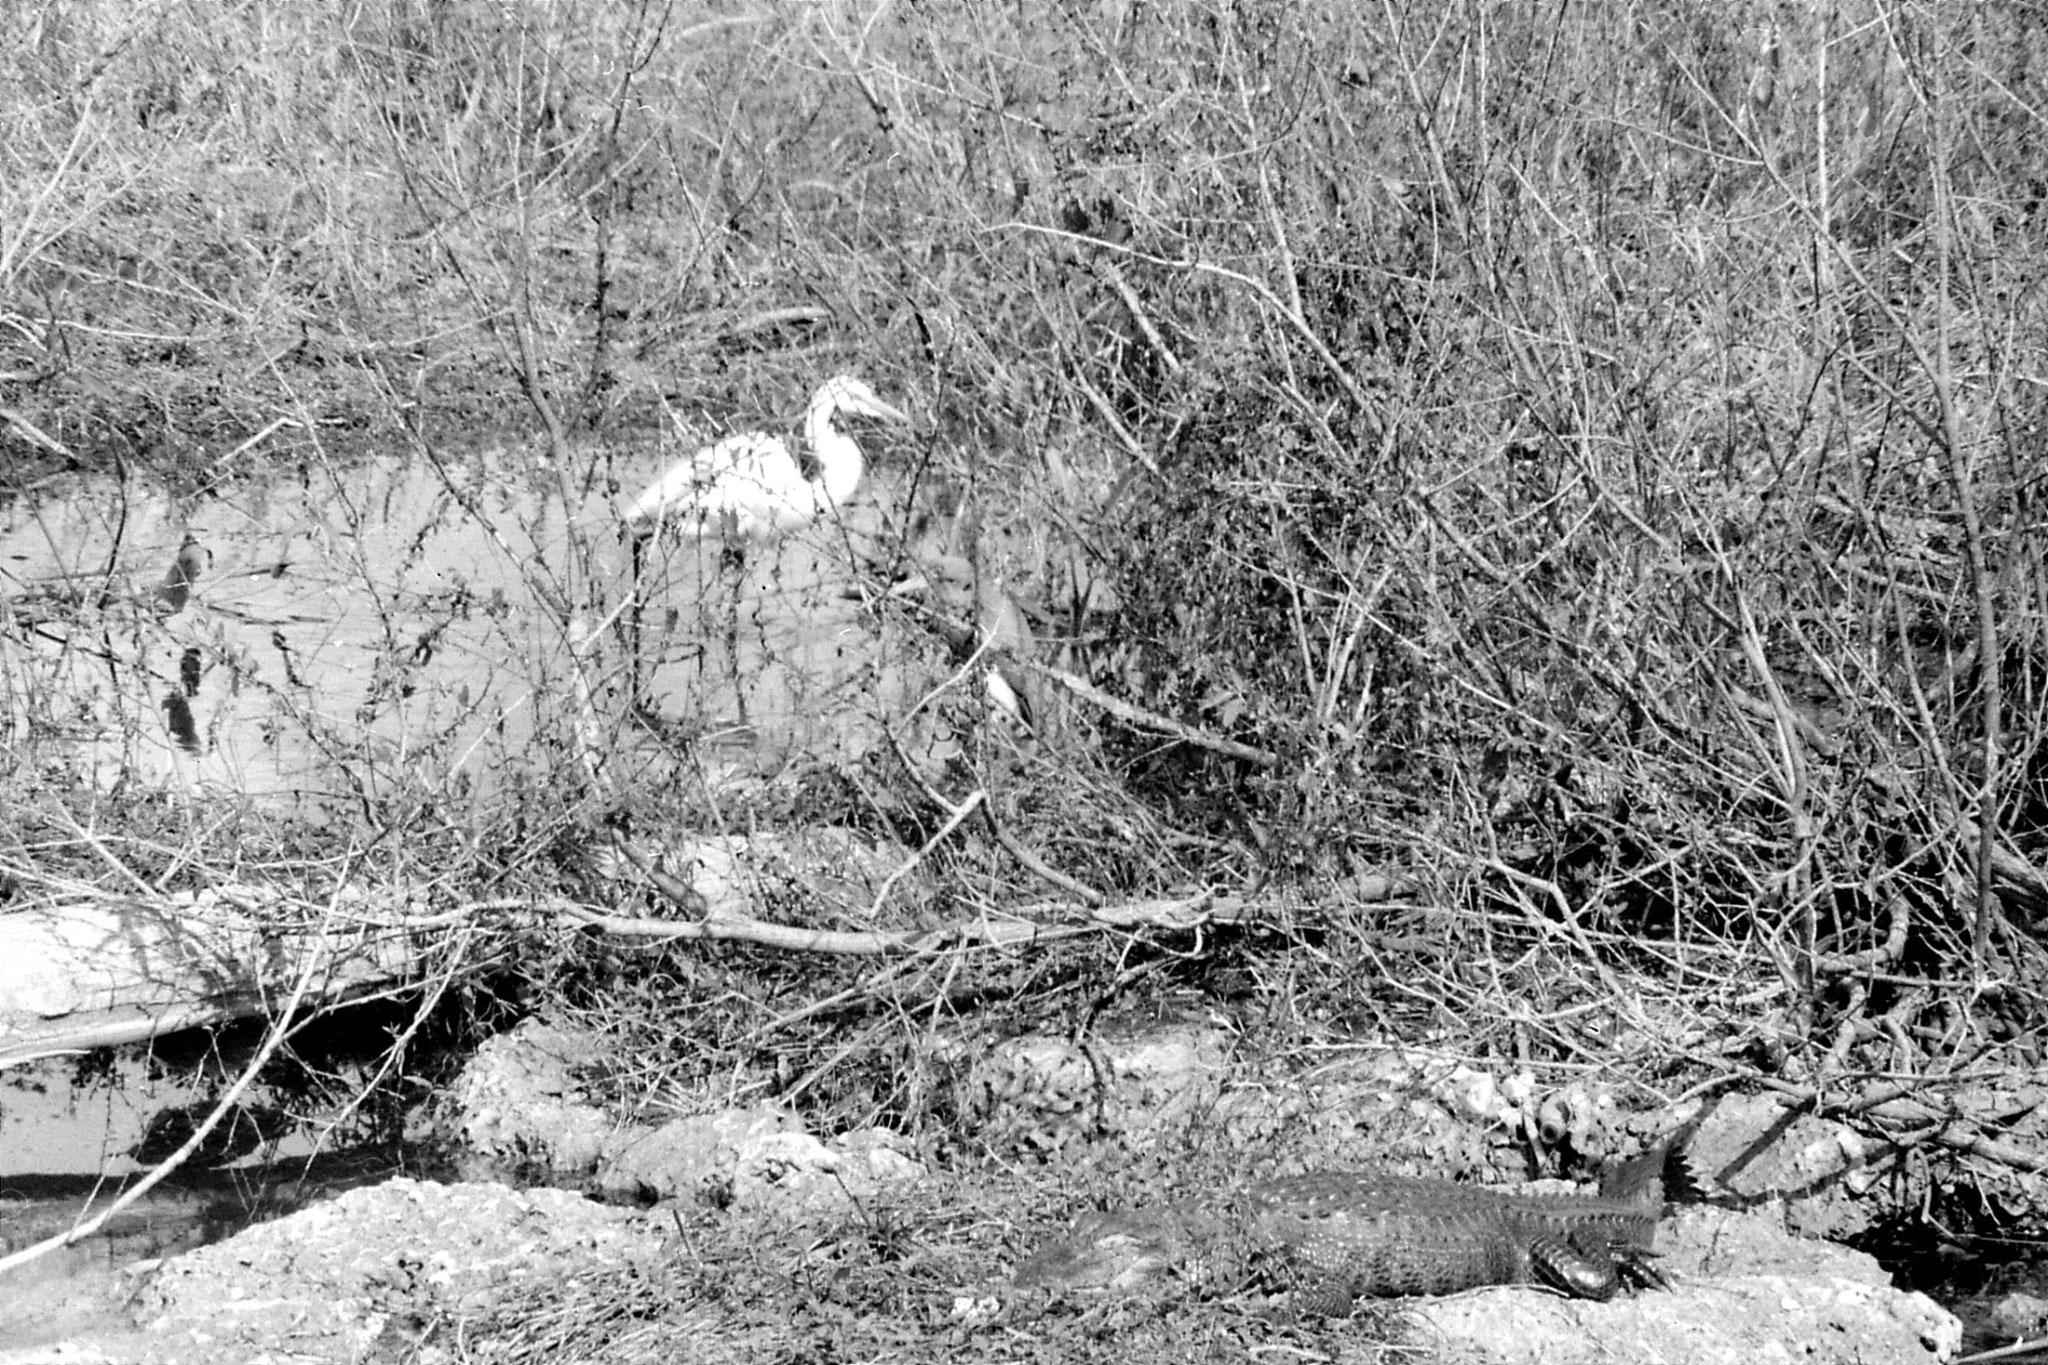 21/12/1990: 11: Everglades